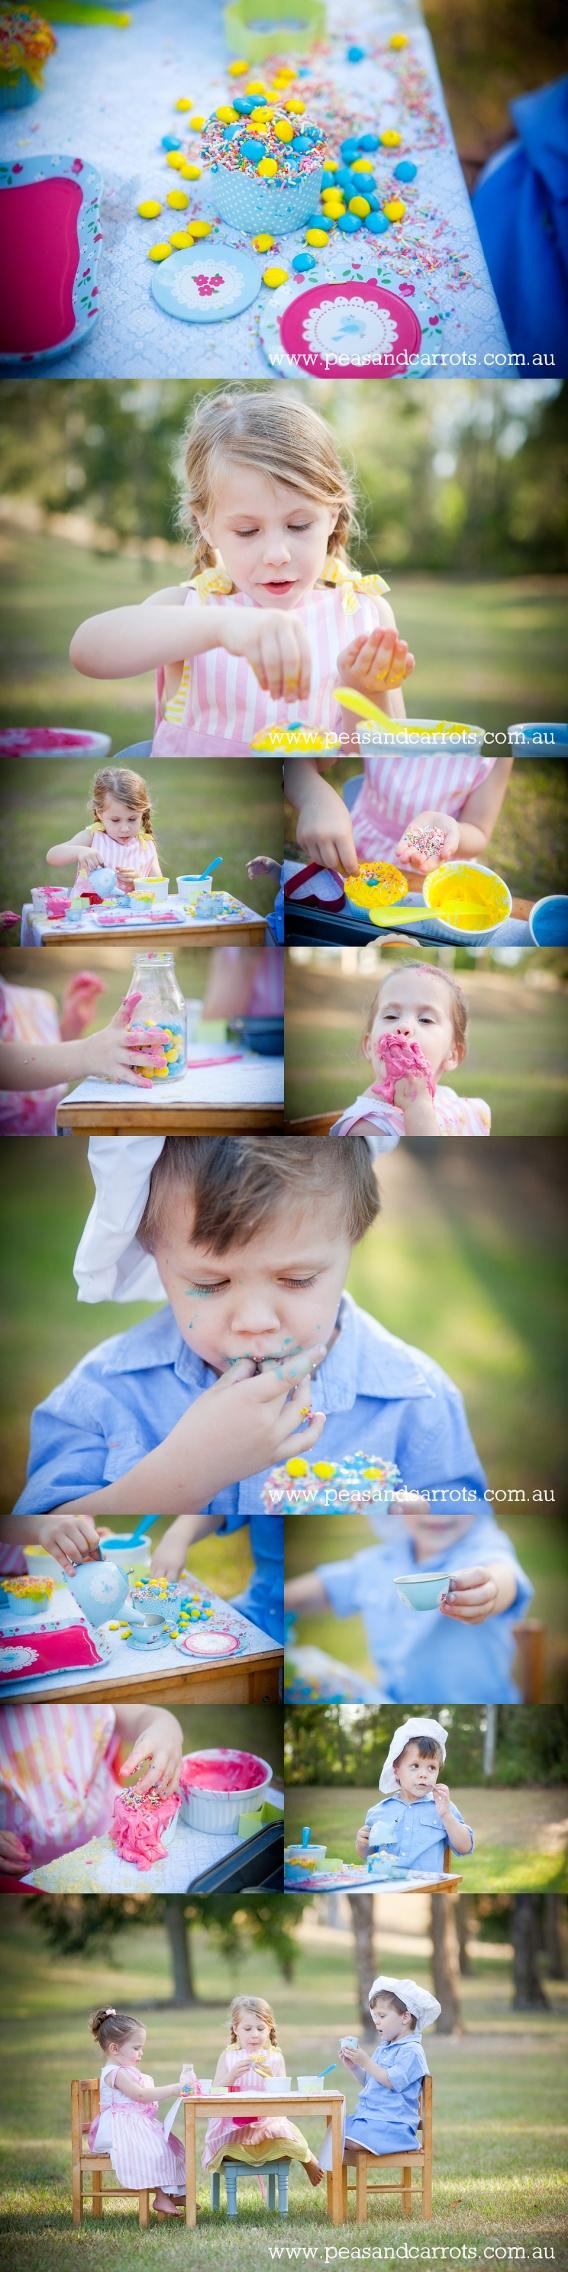 Brisbane, Dayboro and Samford Baby, Children & Family Portrait Photography ~ Peas & Carrots Photography.  Award winning children